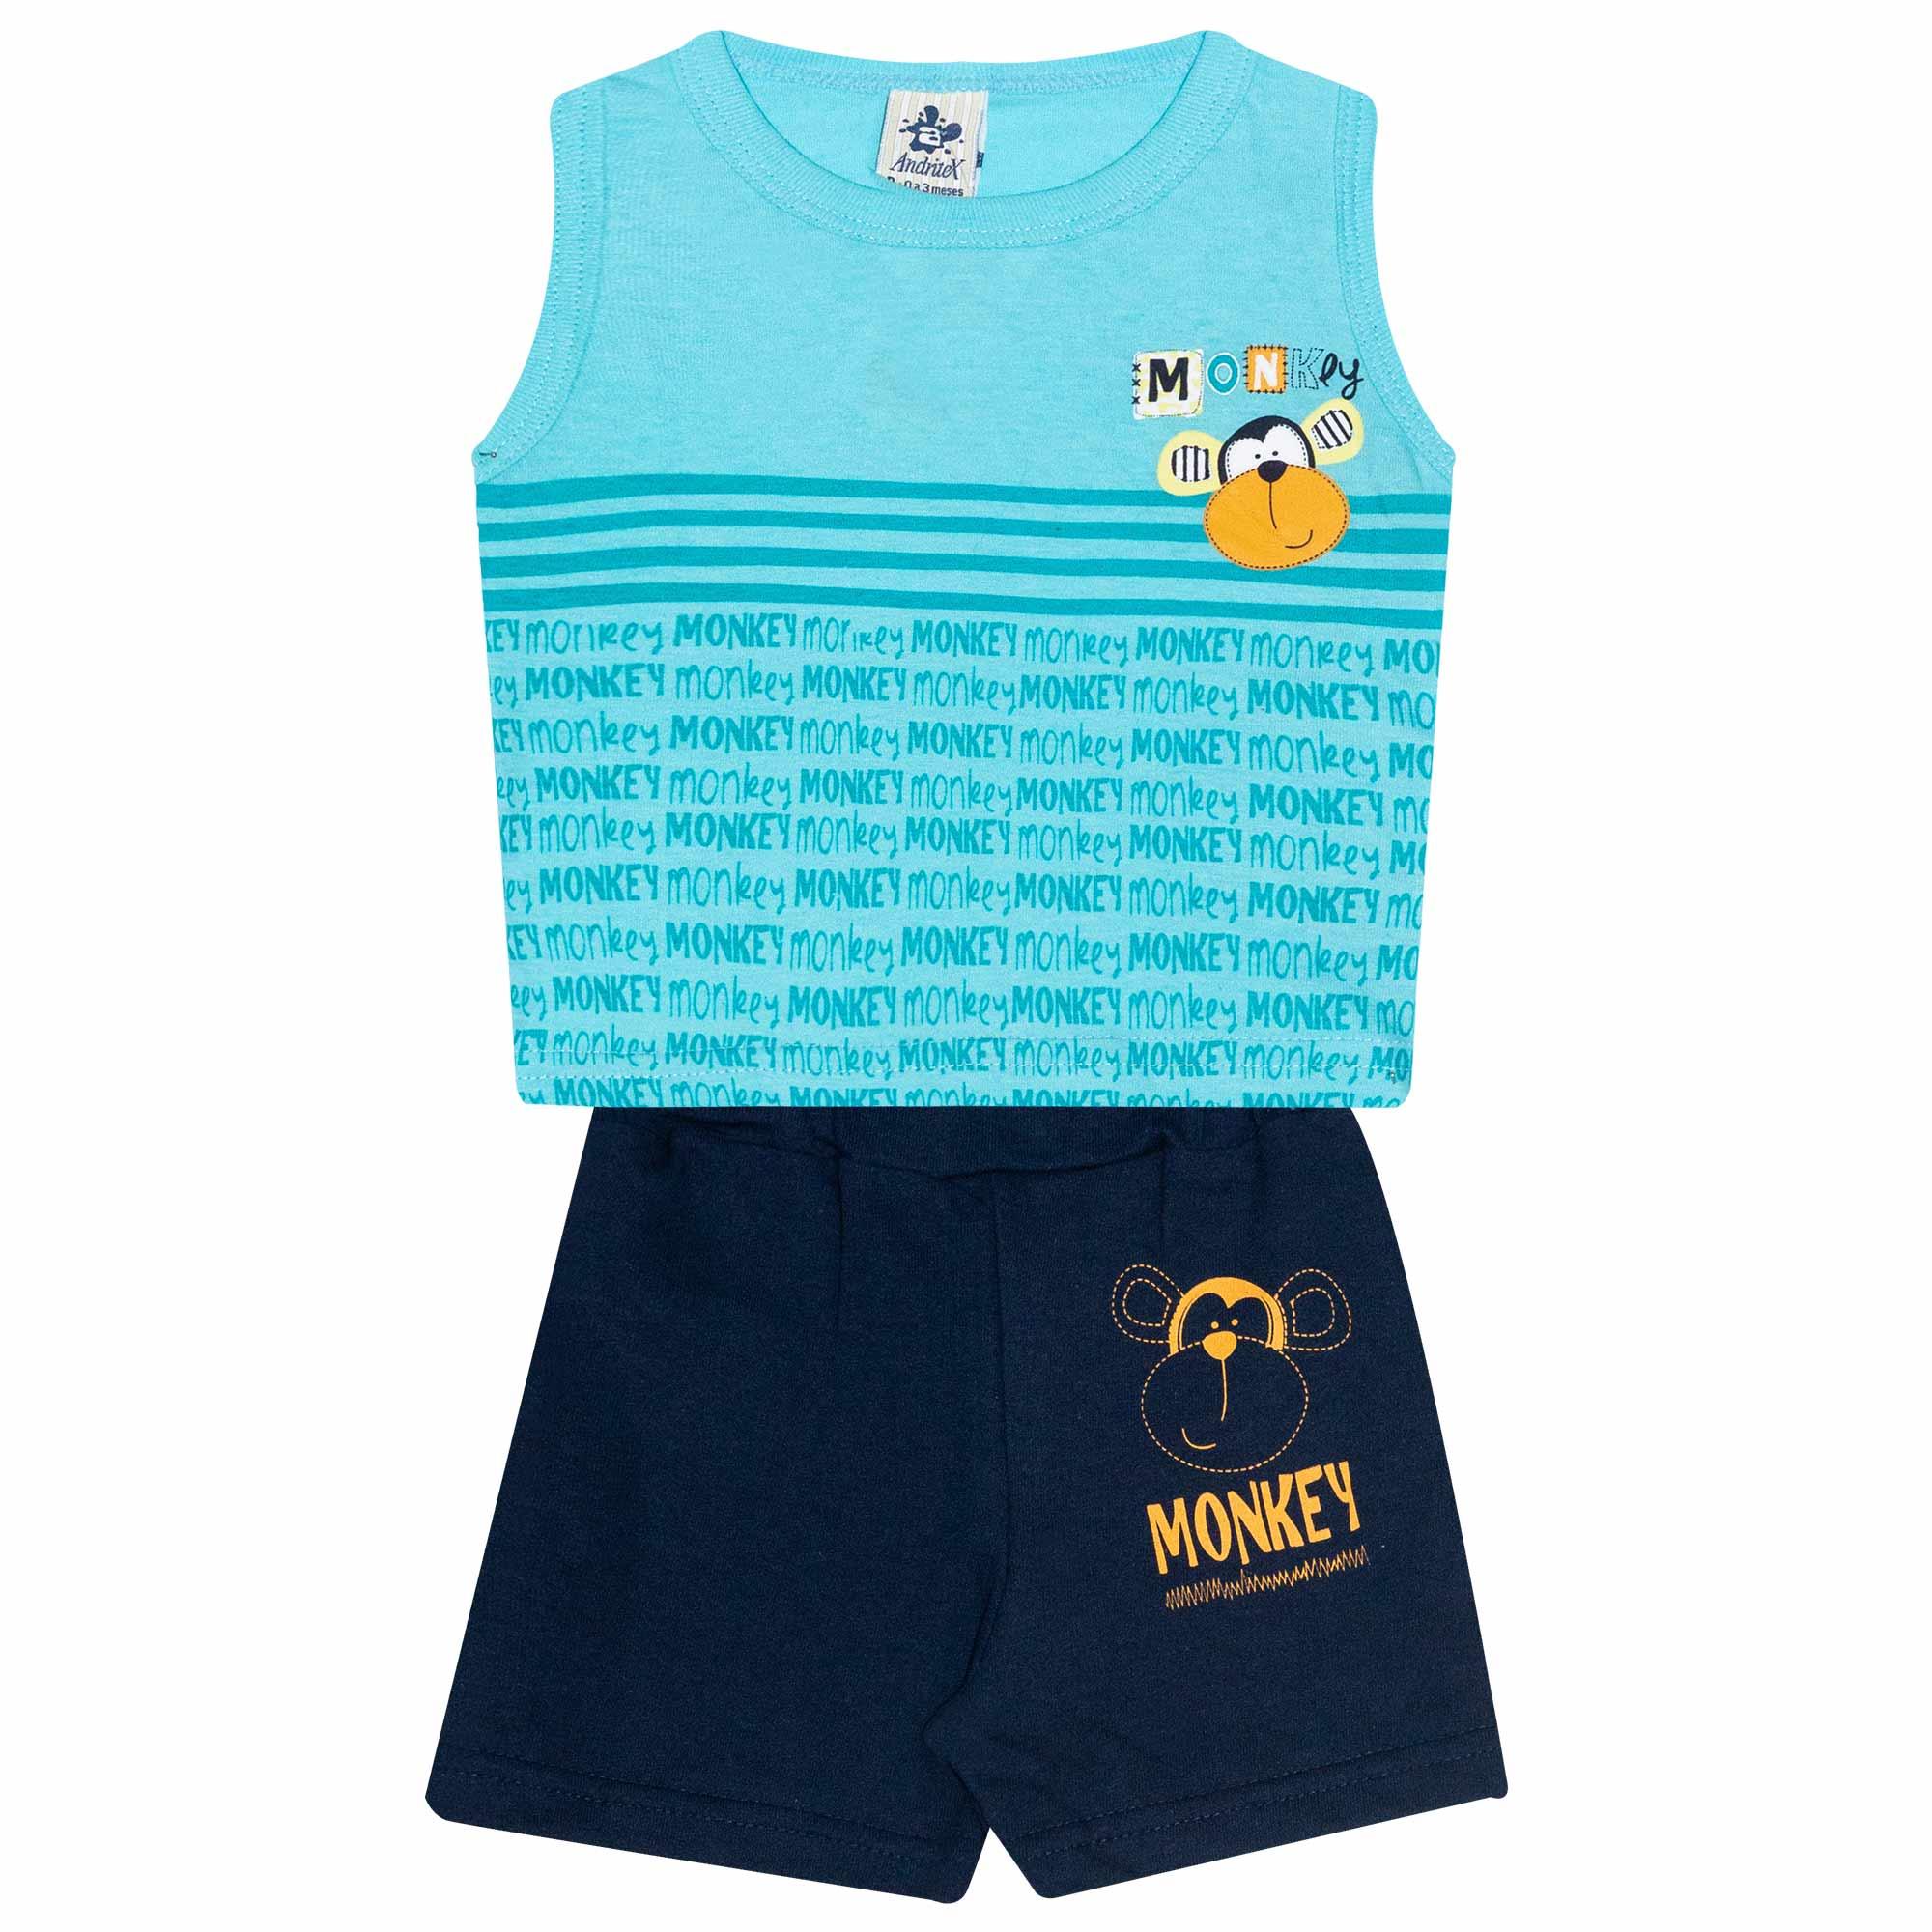 Conjunto Regata Infantil Masculino - Ref 4701  - Azul - Andritex